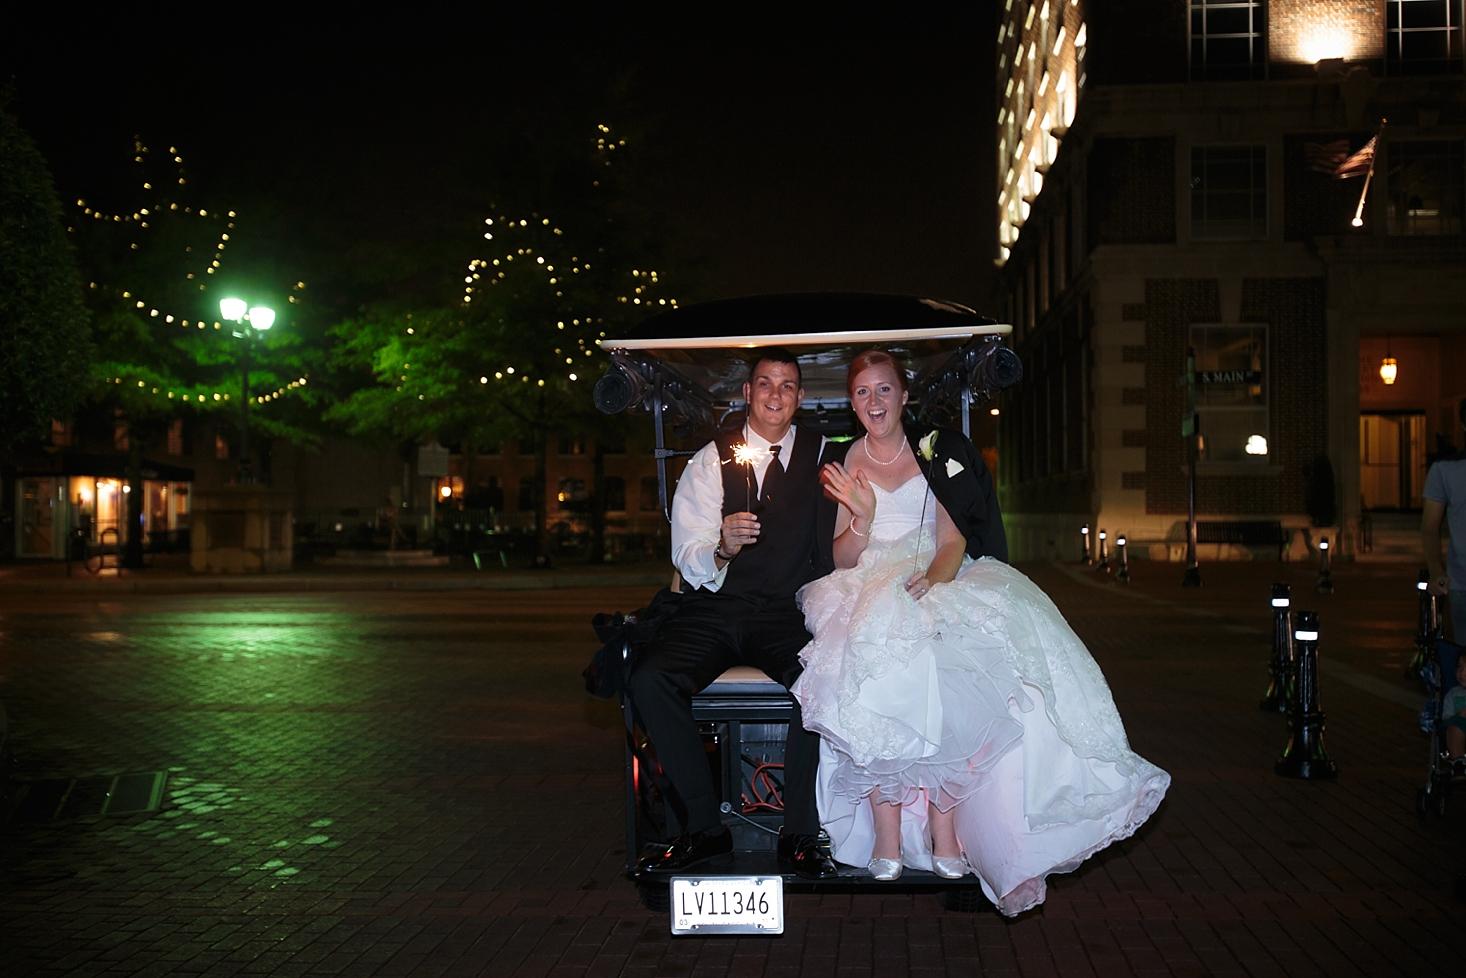 20140719_CJ-westin-downtown-greenville_ashley_amber_photo_0_617-66_blog.jpg